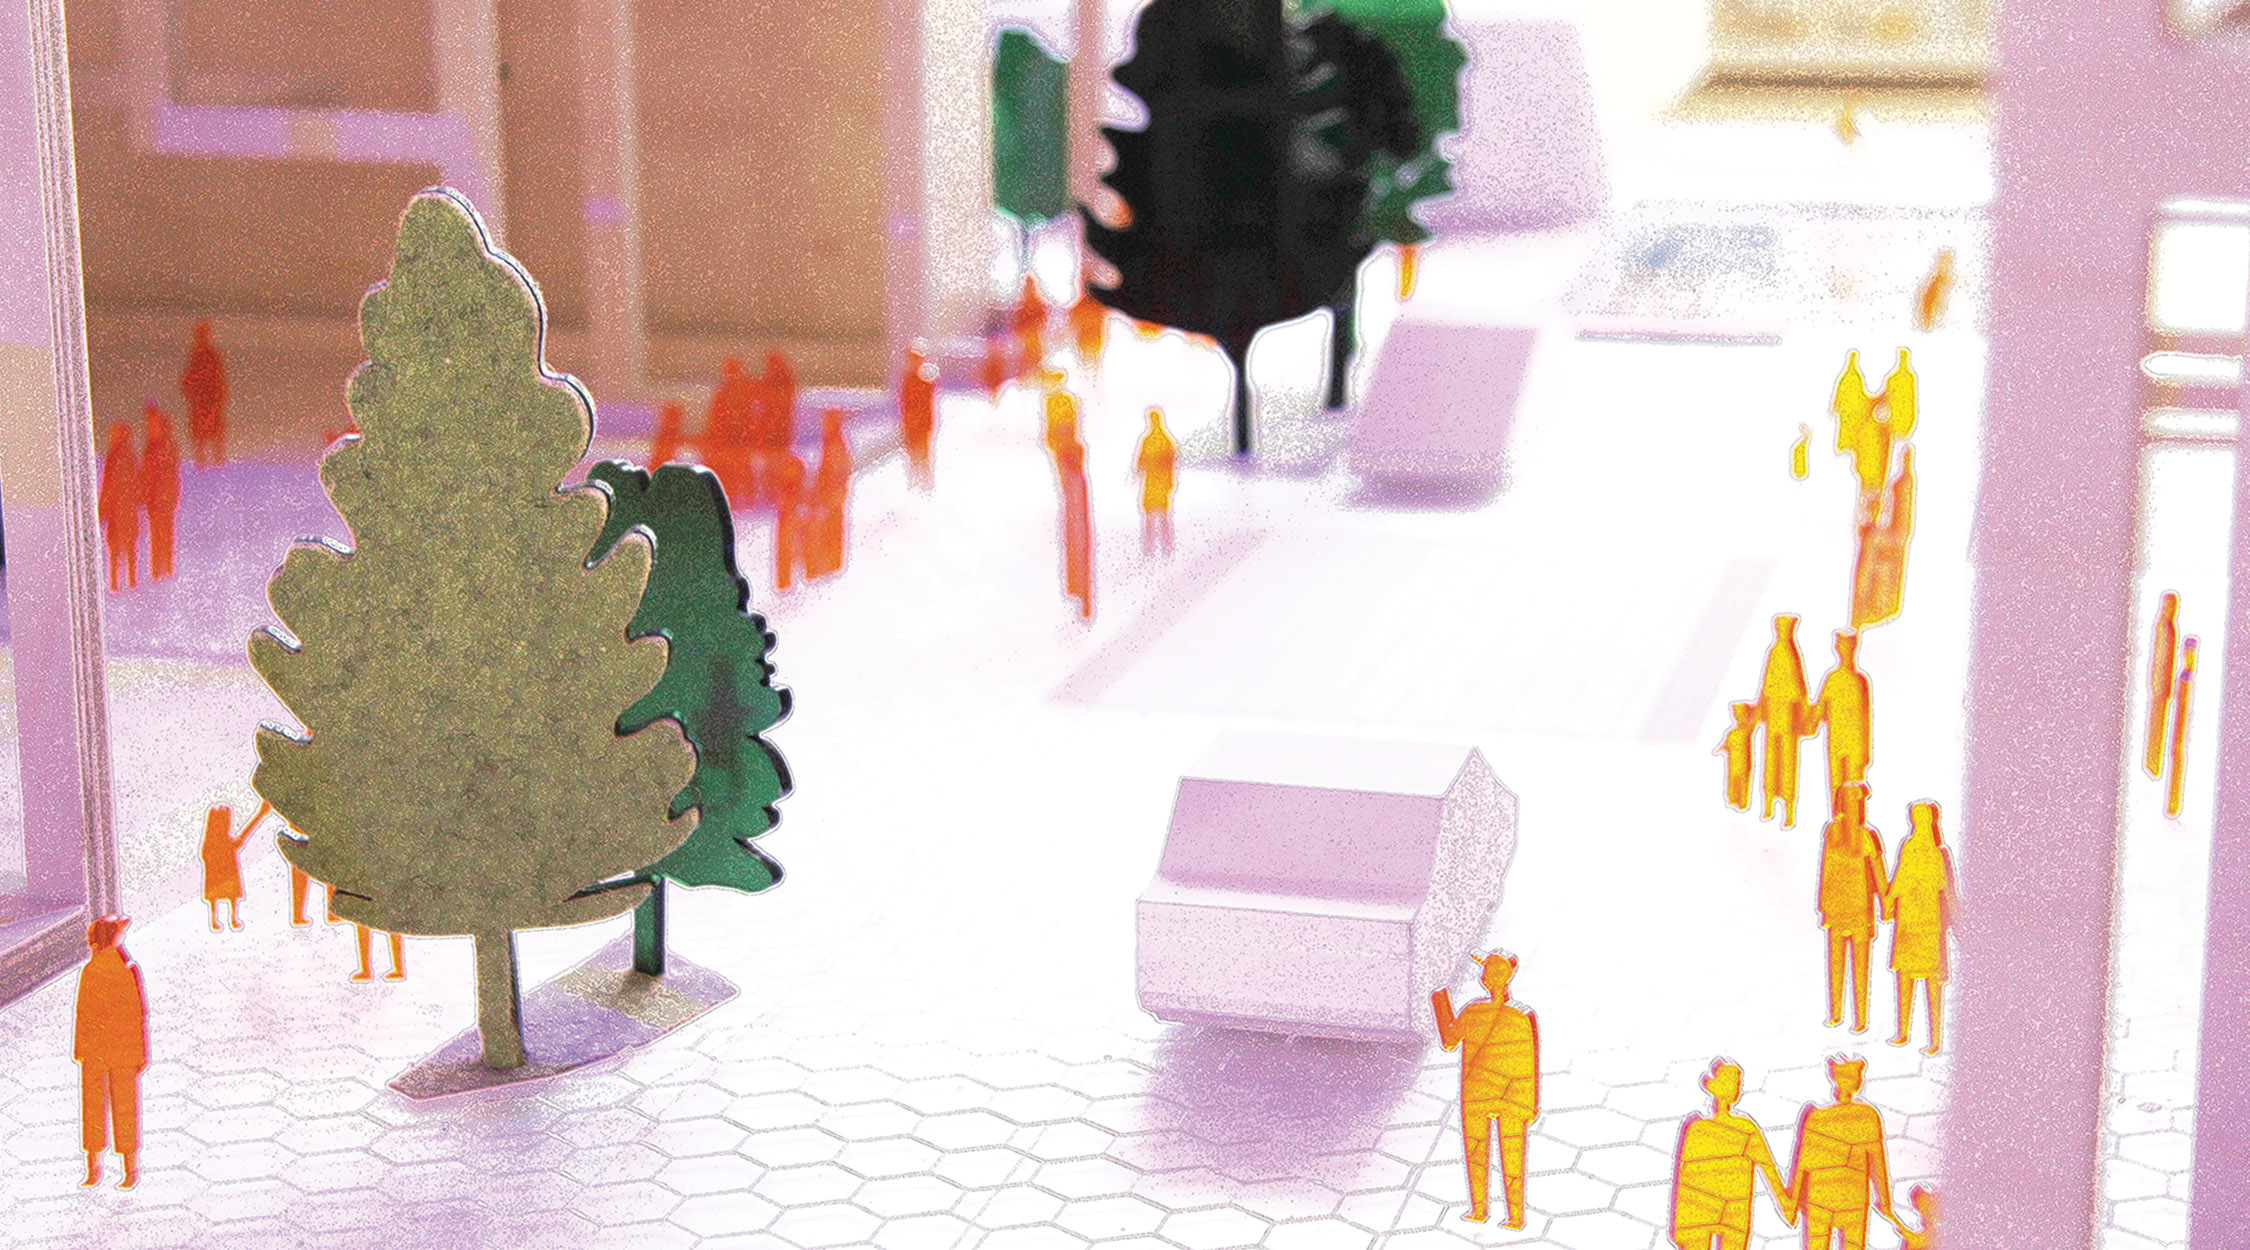 Sidewalk Toronto governance challenge